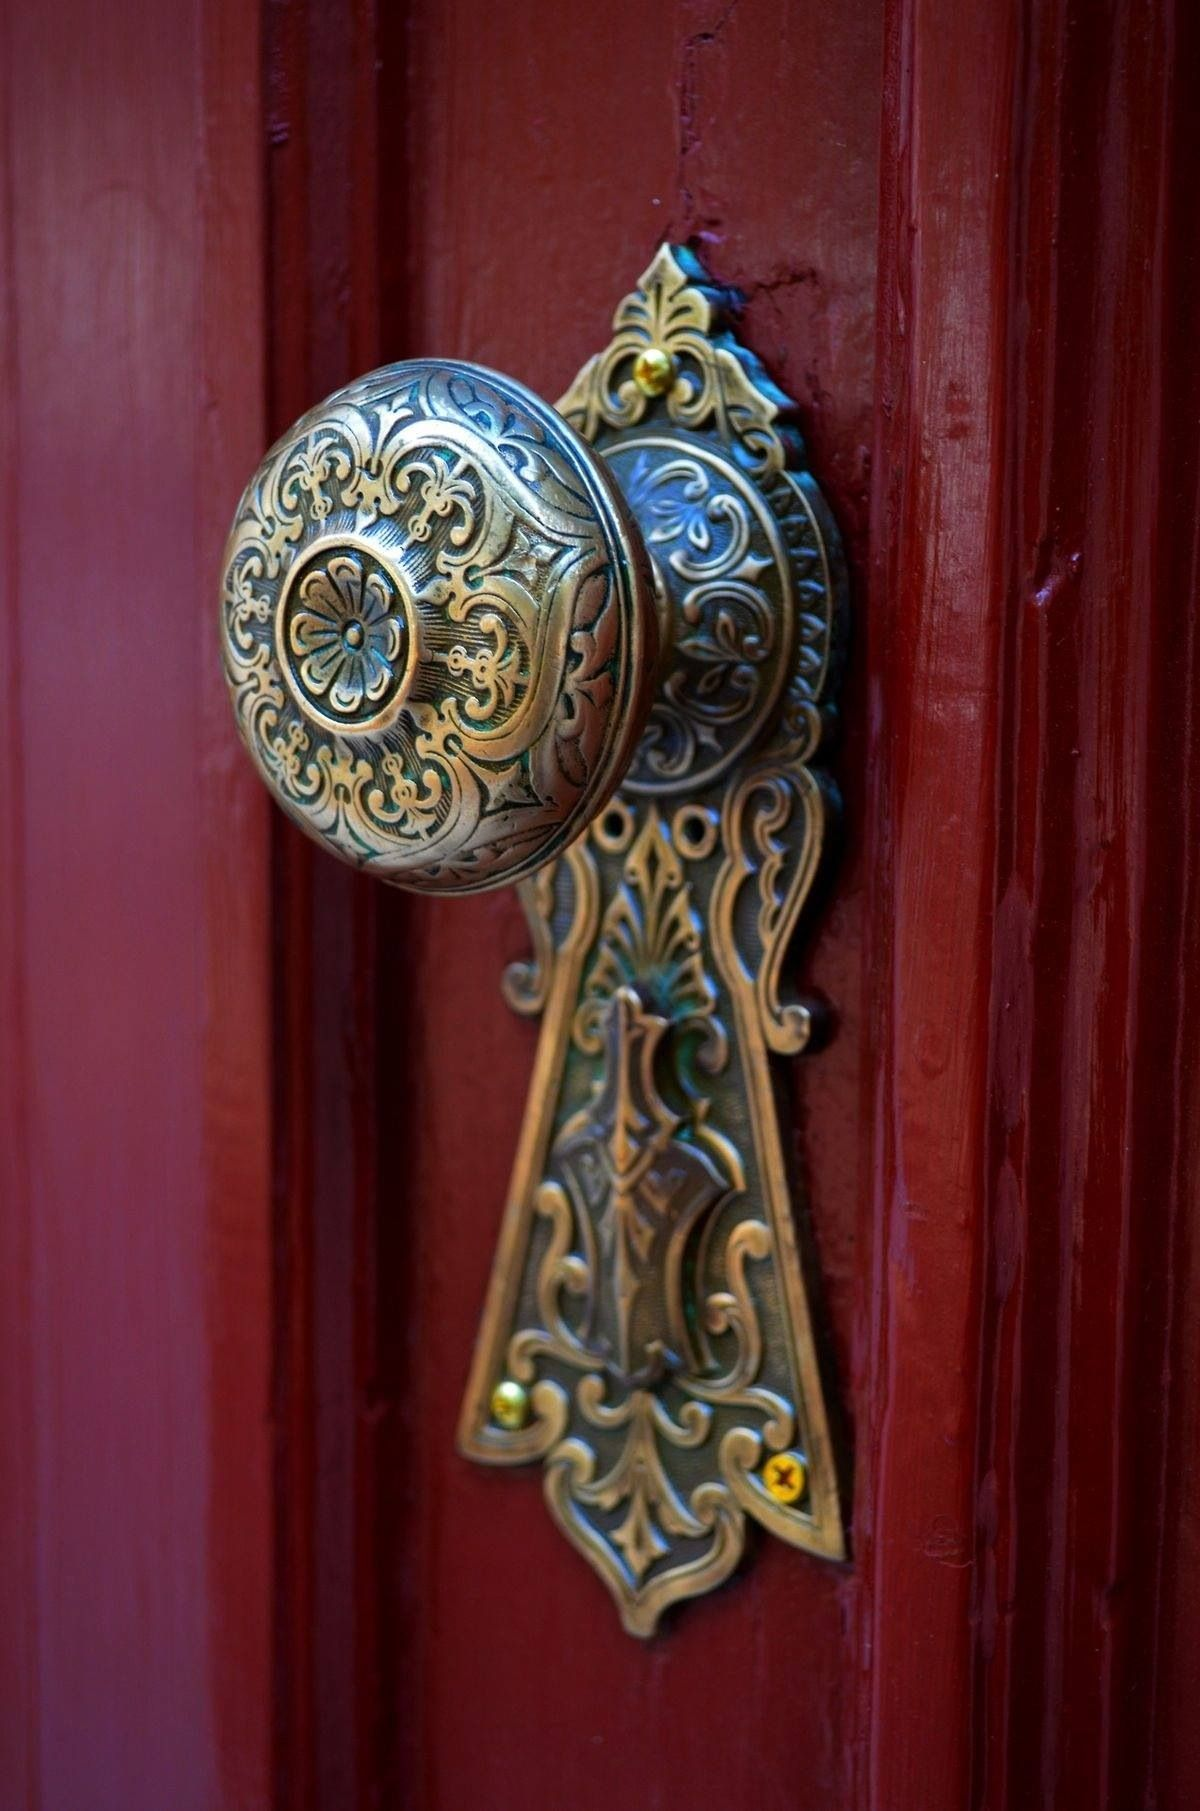 Pin by Elizabeth Sammut Caruana on Doors , Windows and Door knockers ...